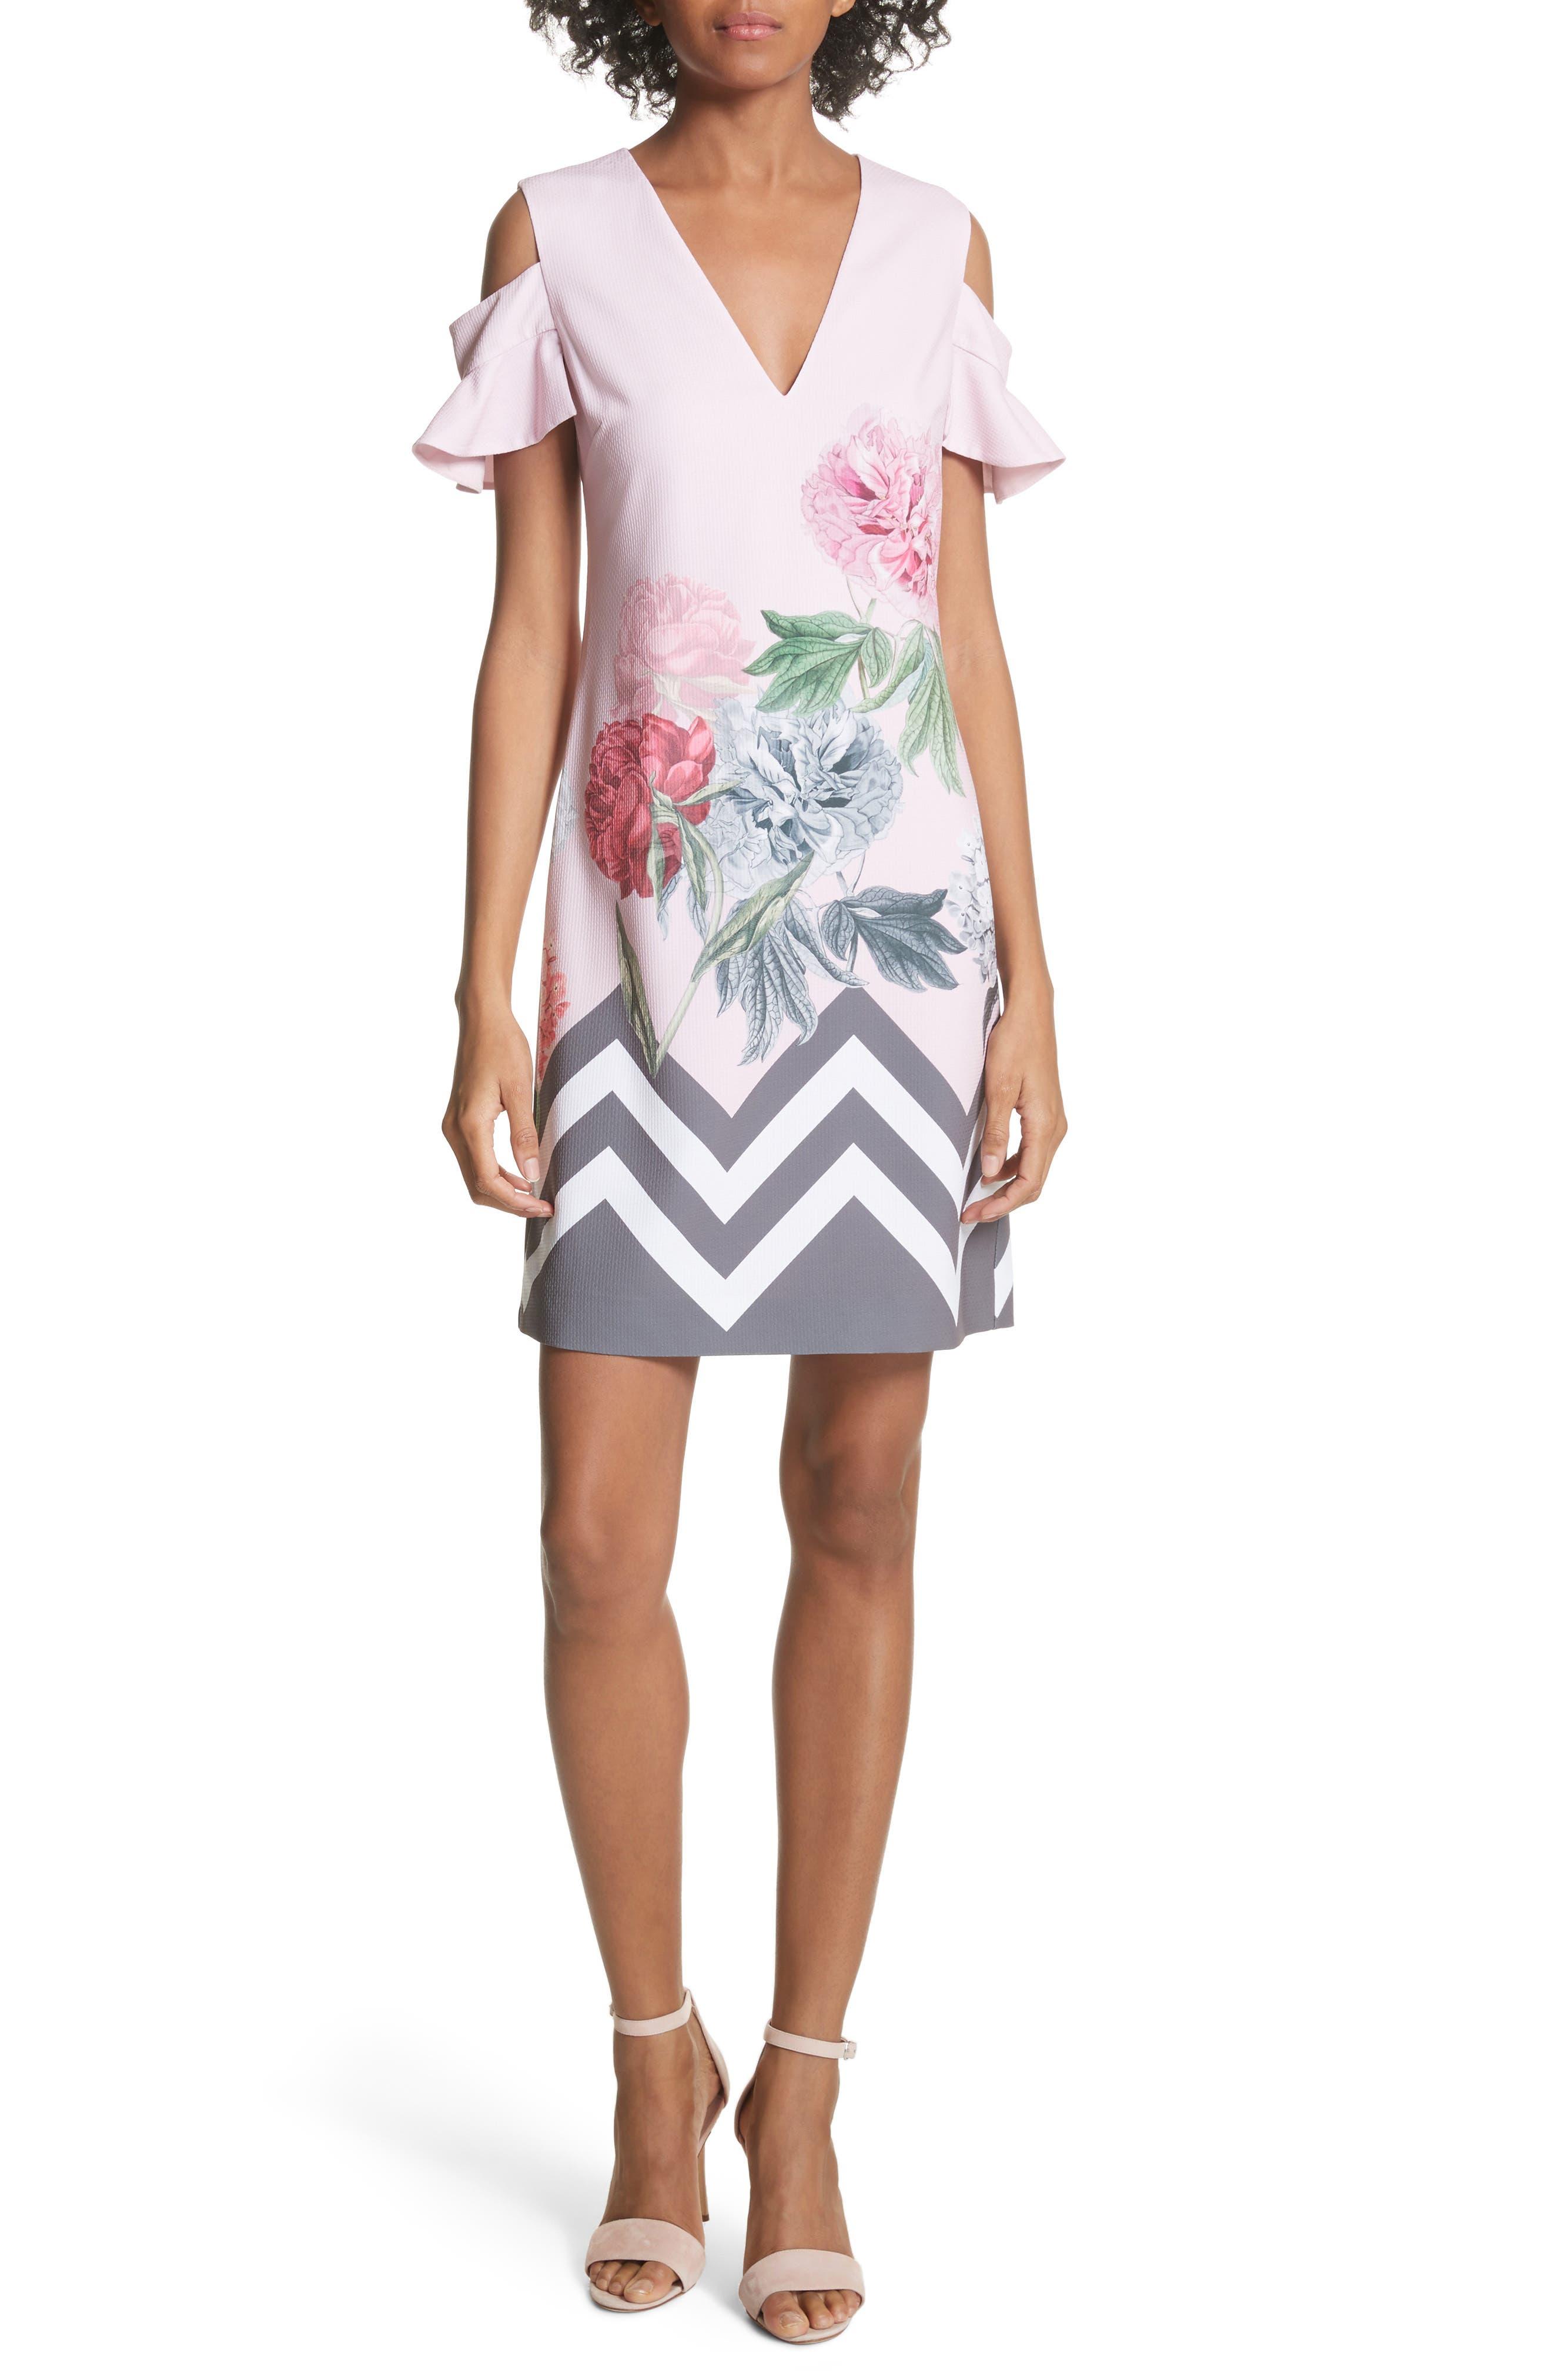 Jareye Cutout Tunic Dress,                             Main thumbnail 1, color,                             Dusky Pink